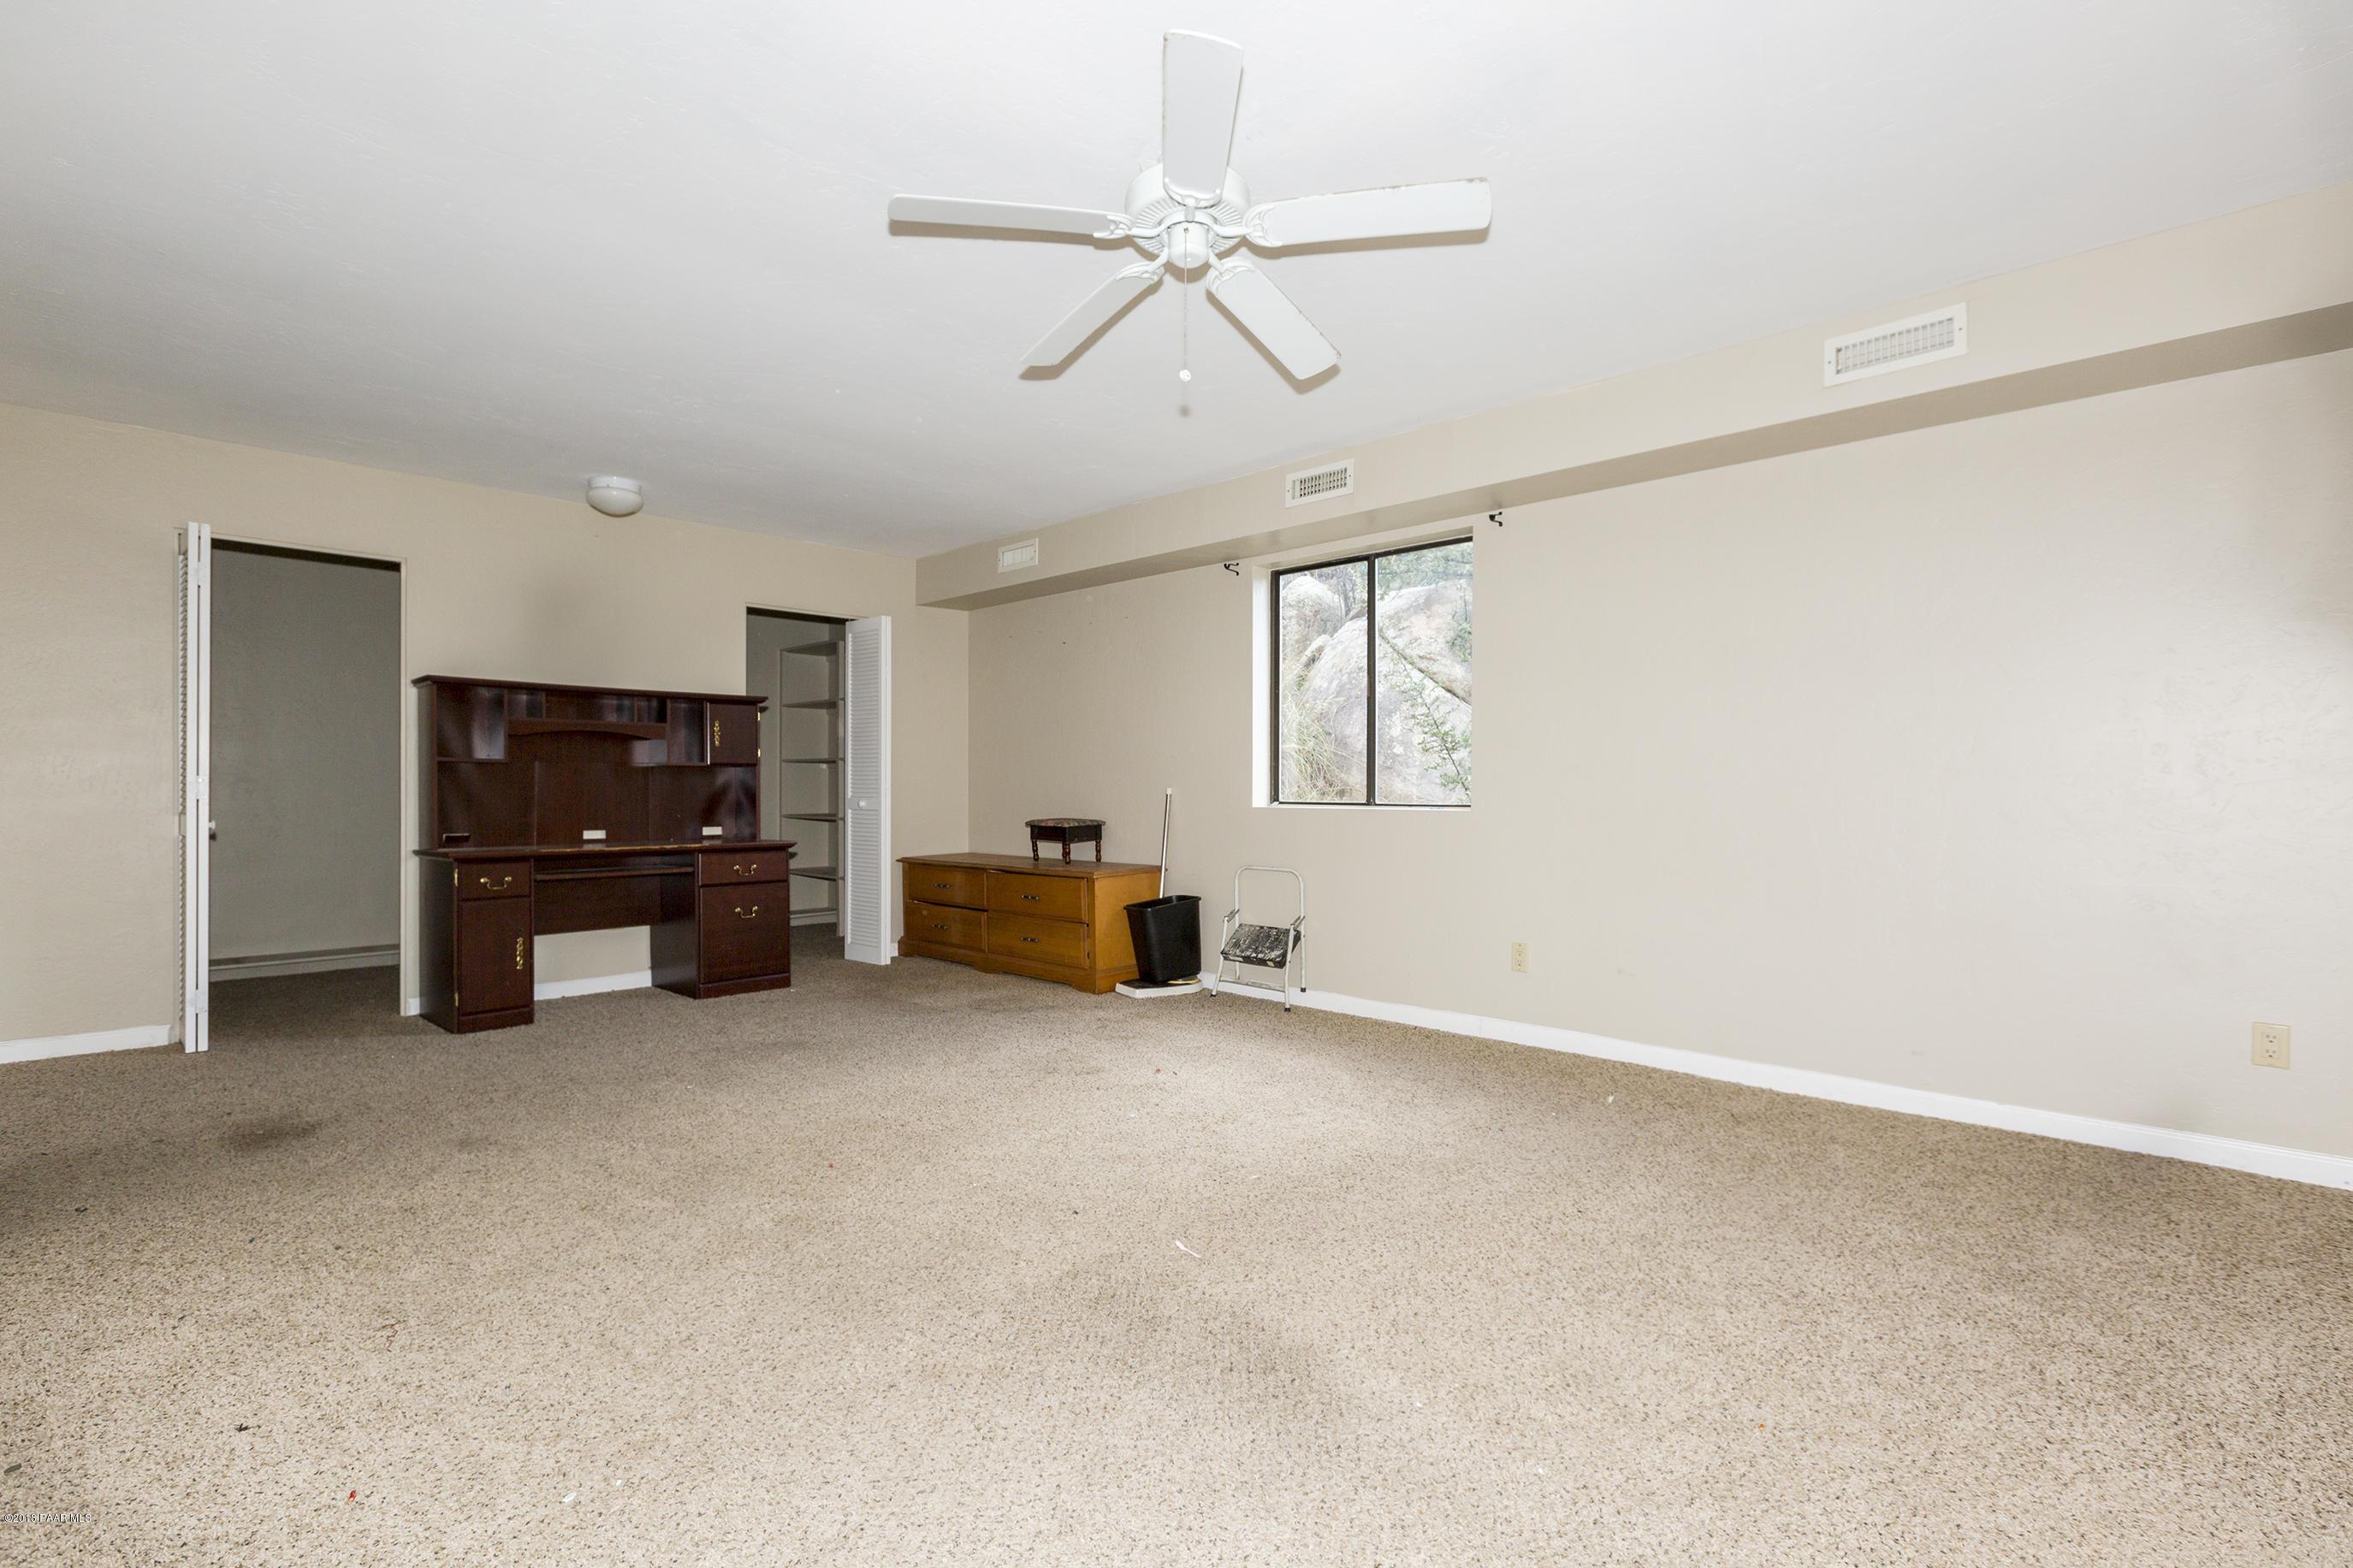 413 Keen Street Prescott, AZ 86305 - MLS #: 1016084